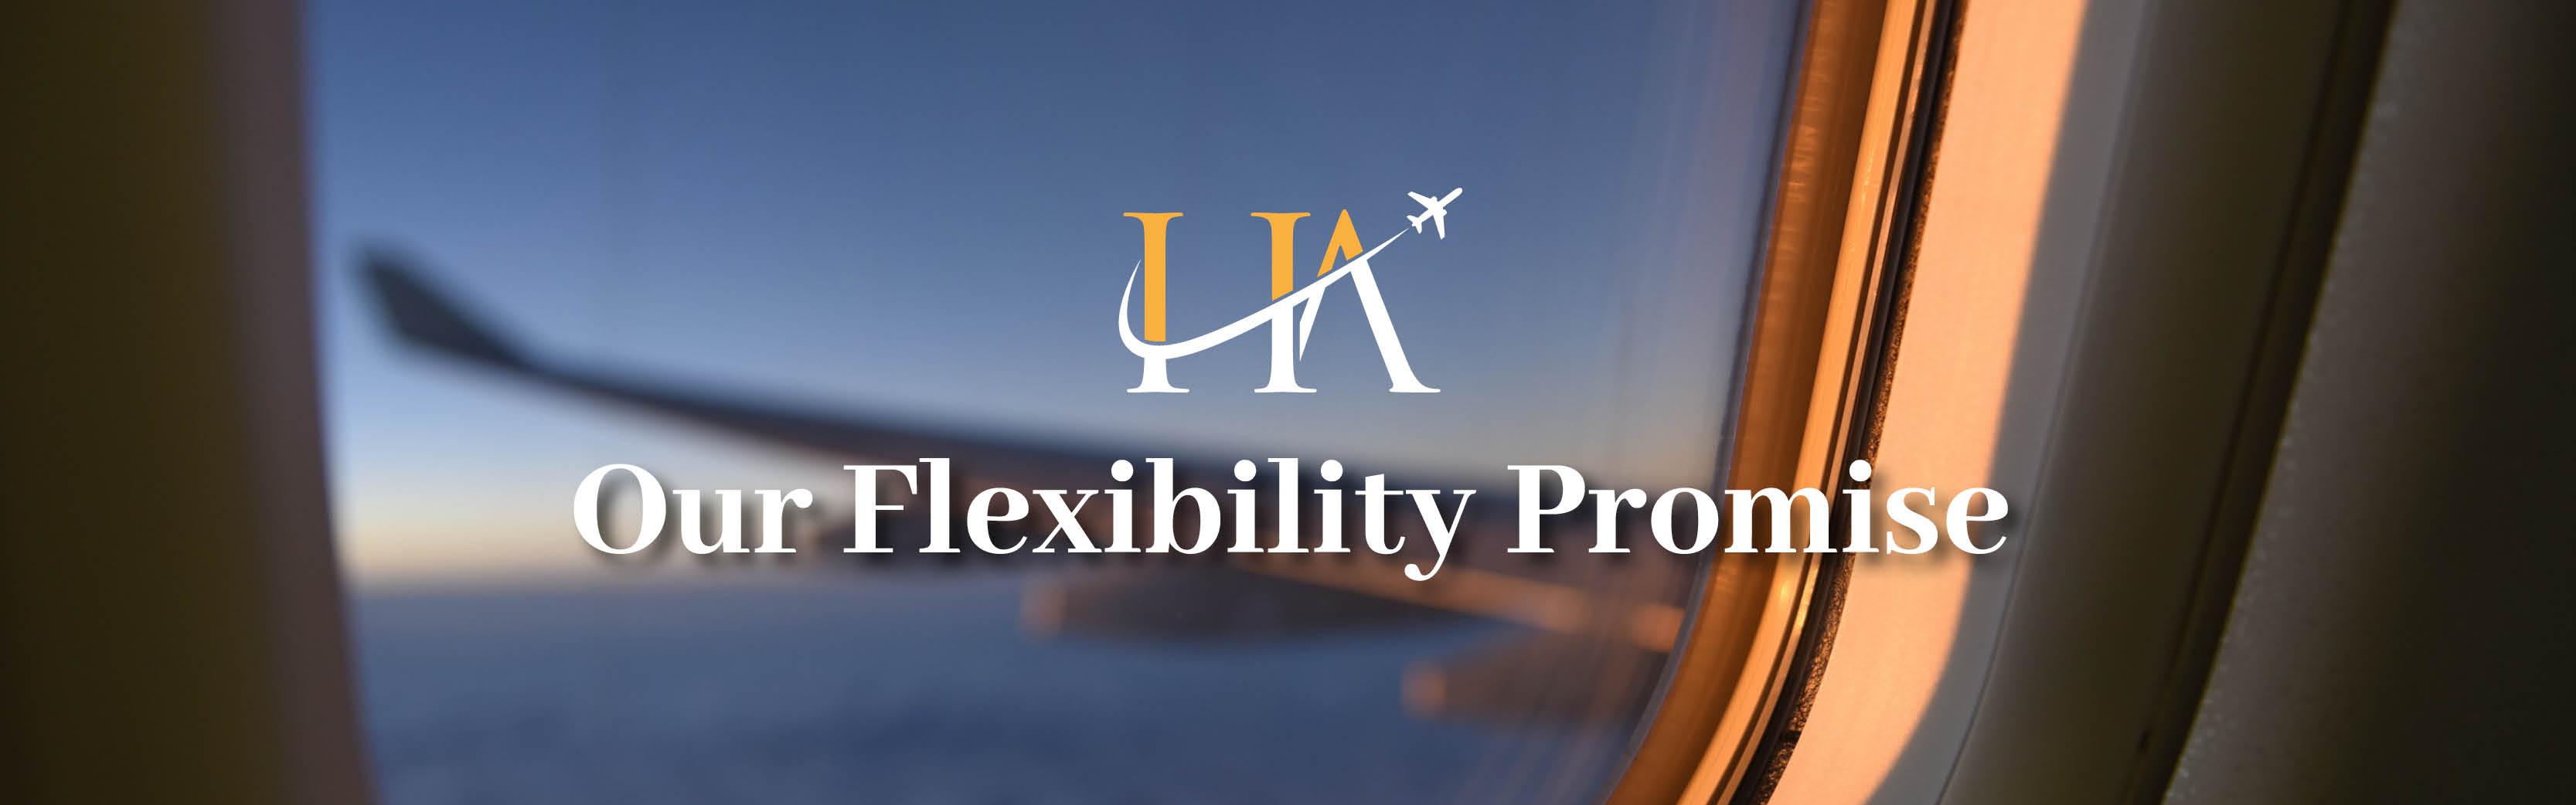 Our flexibility promise